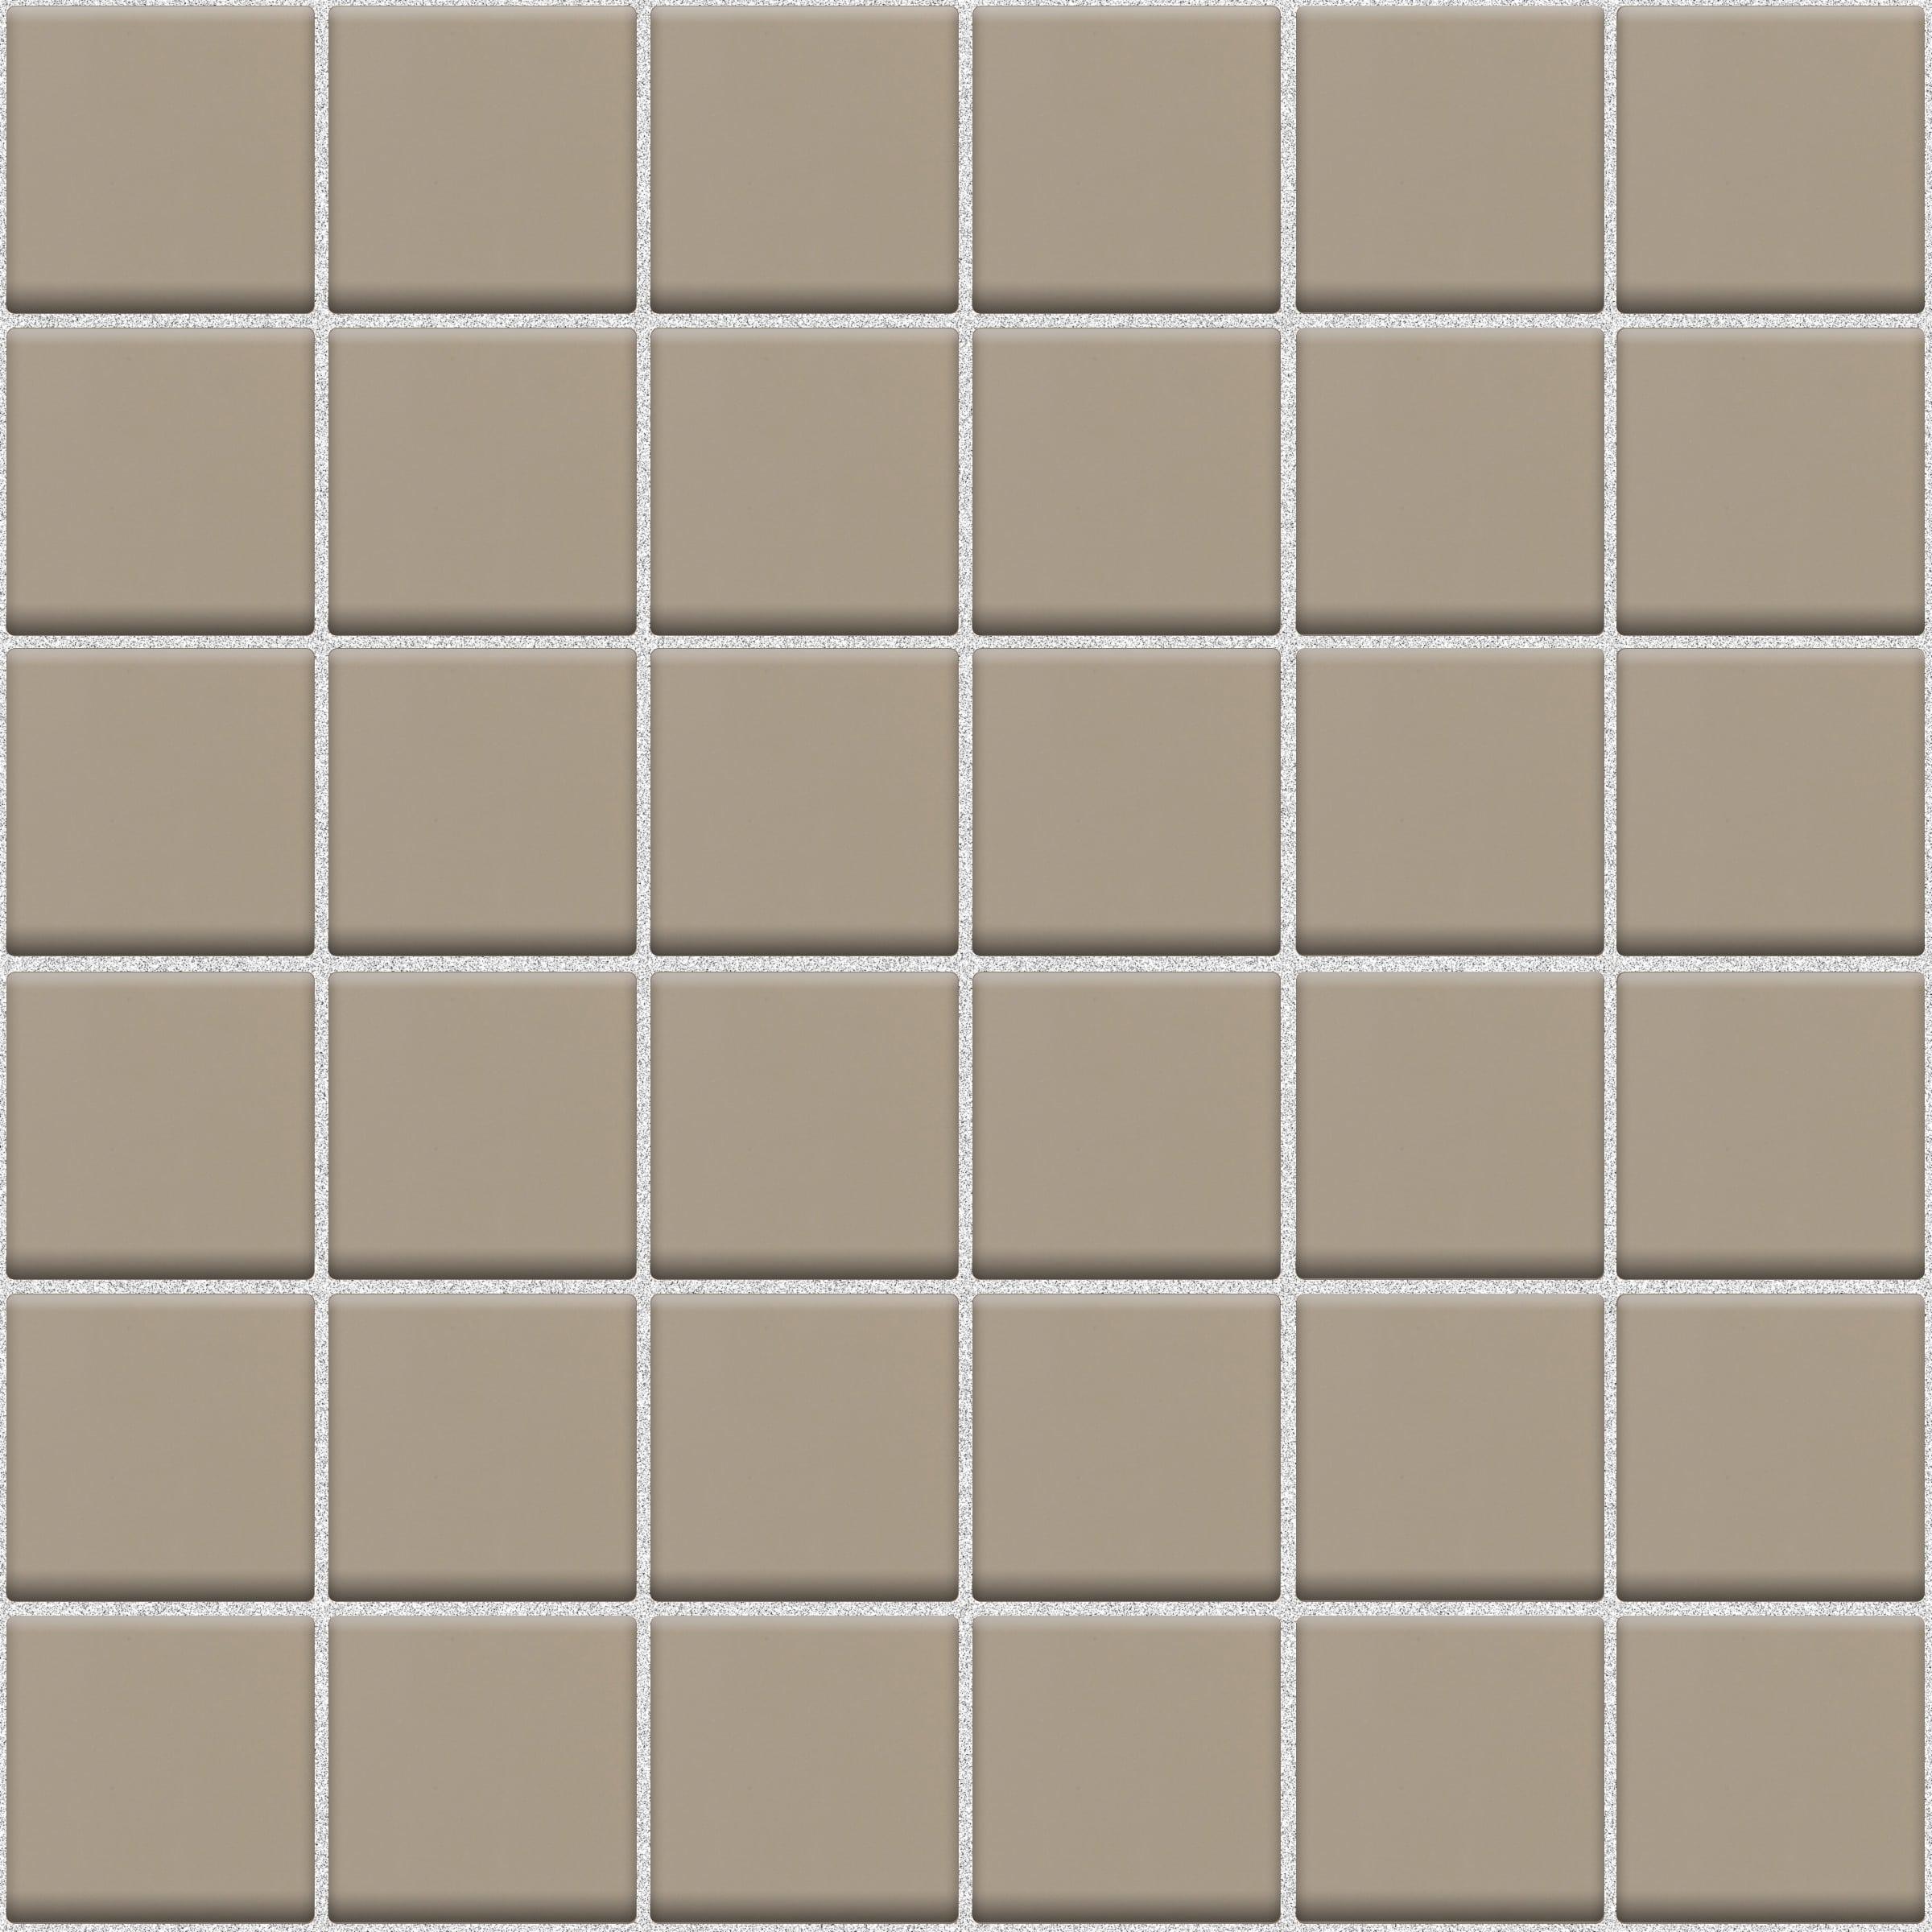 Discontinued daltile ceramic tile choice image tile flooring dal ceramic tile images tile flooring design ideas discontinued daltile ceramic tile images tile flooring design dailygadgetfo Images